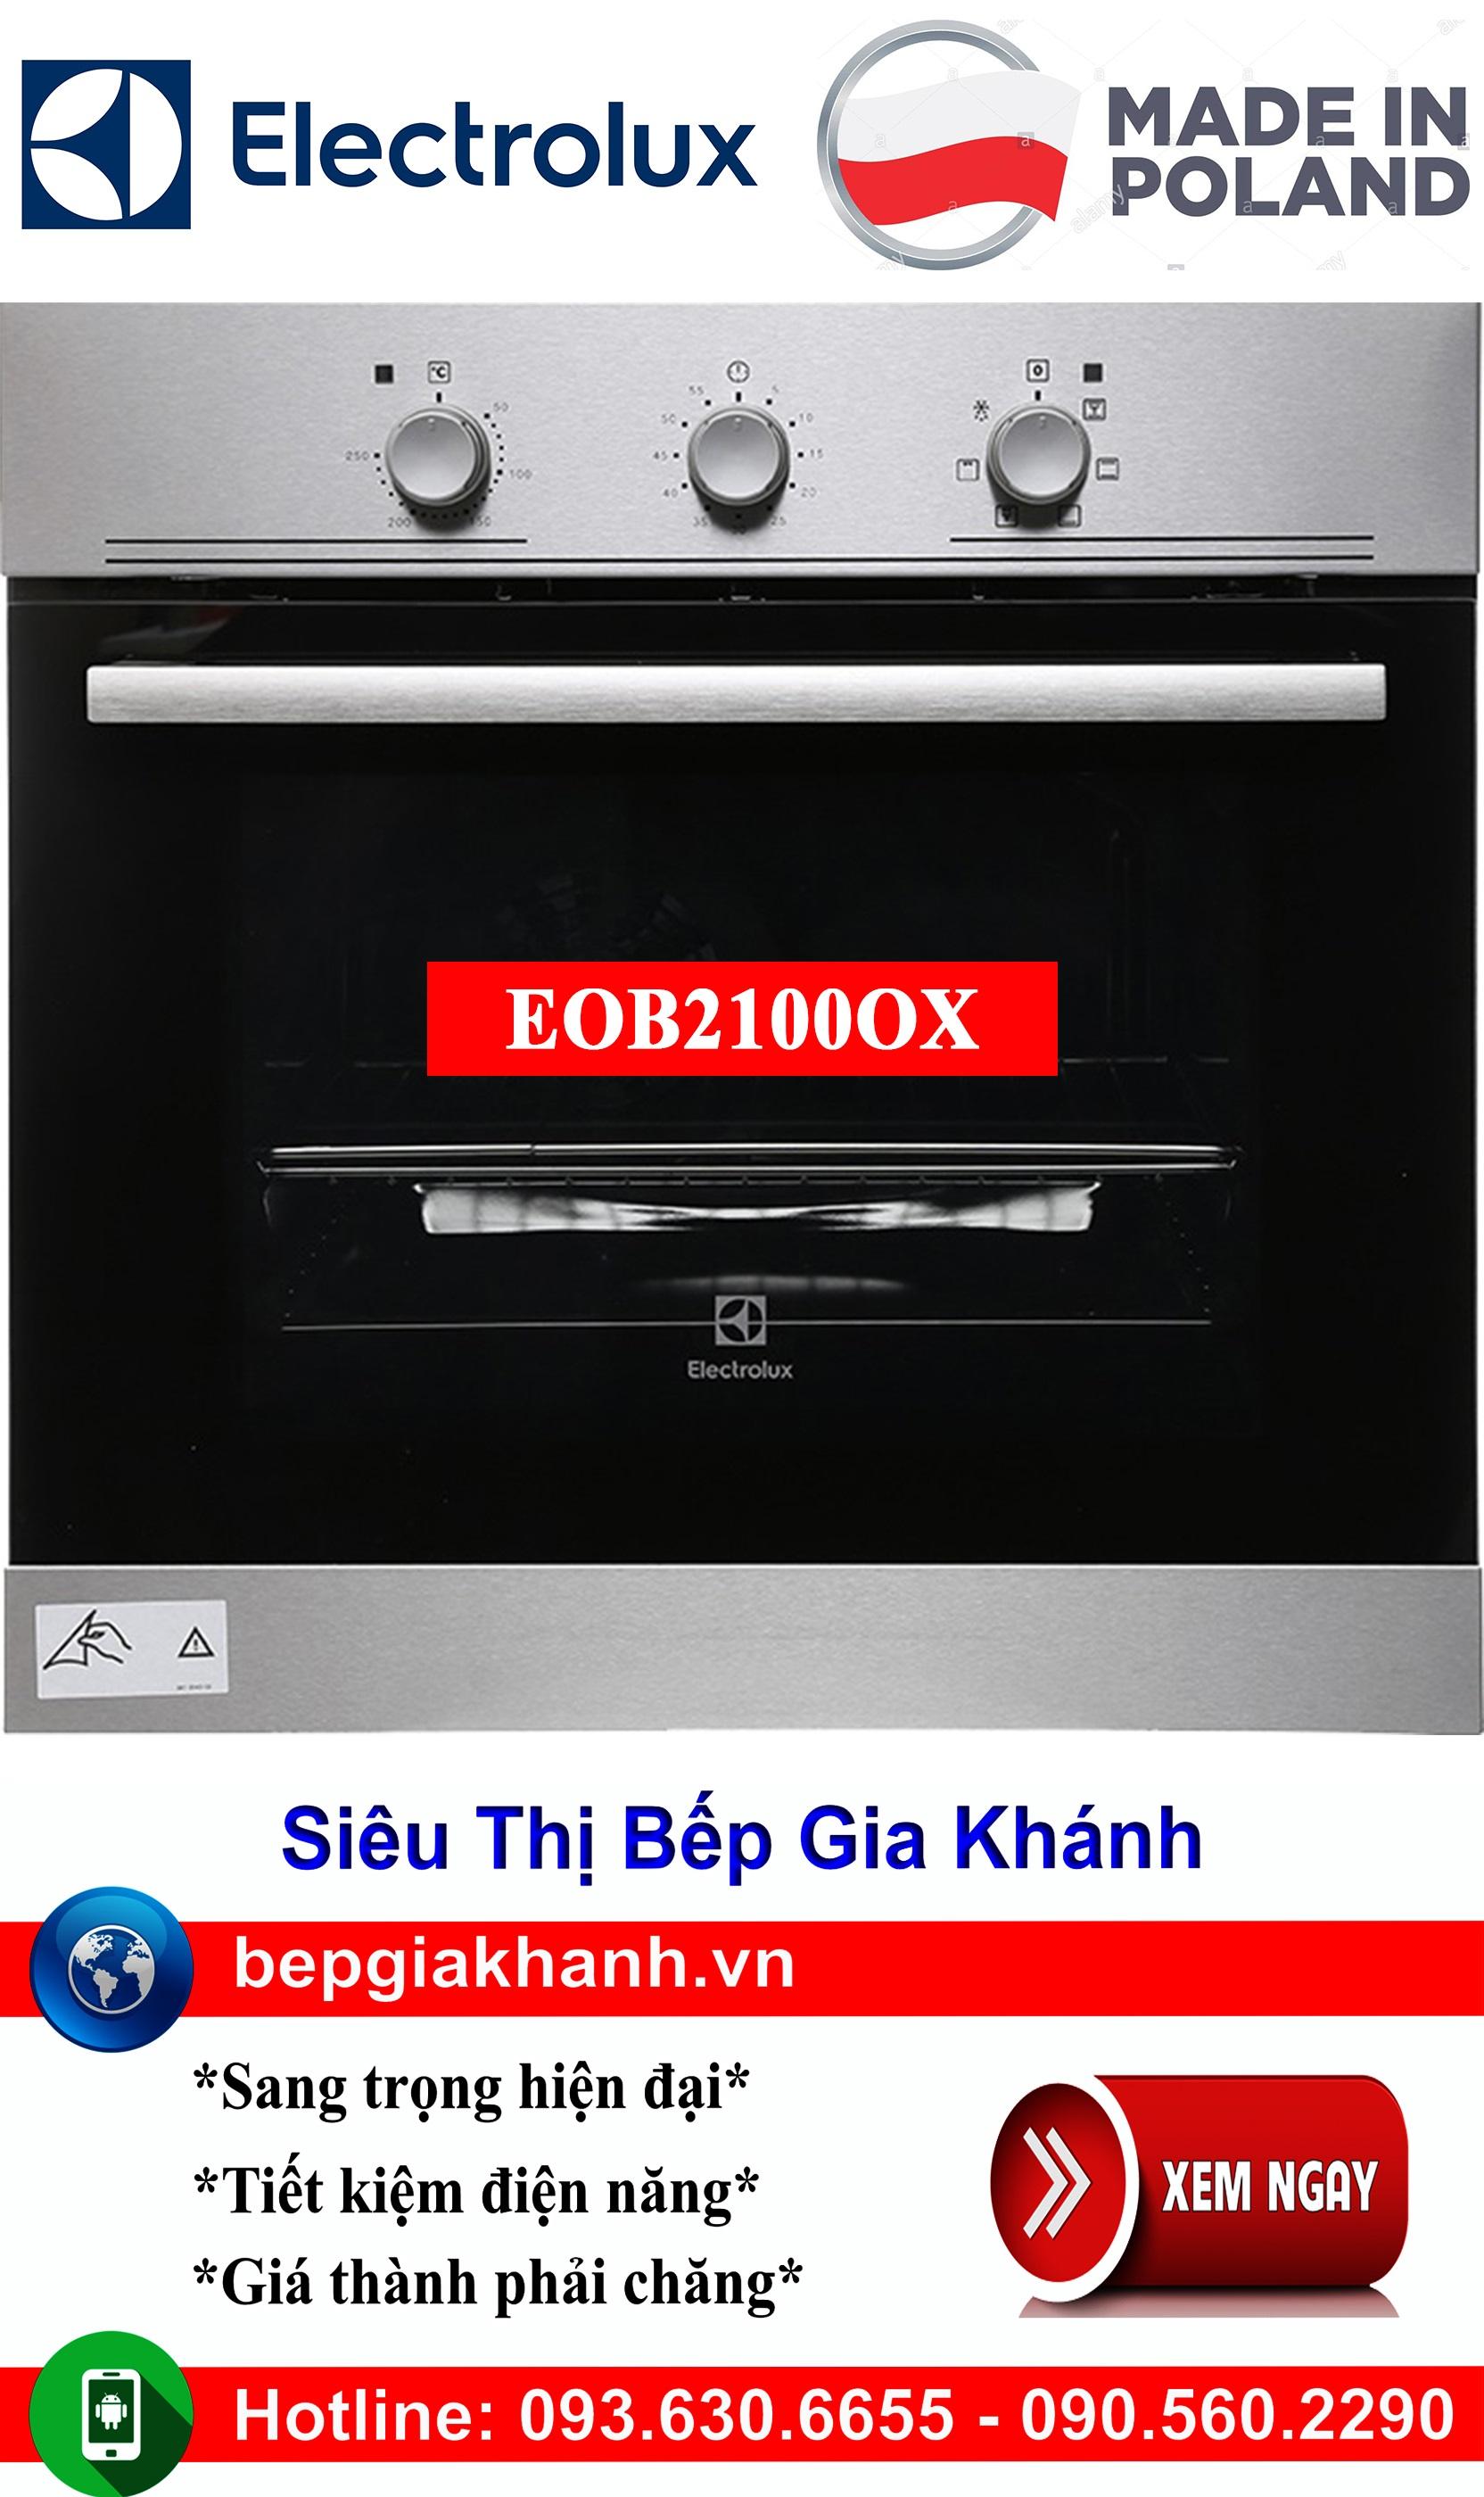 Lò nướng lắp âm tủ Electrolux EOB2100OX nhập khẩu Ba Lan, lò nướng, lò nướng điện, lò nướng điện đa năng, lò nướng mini, lò nướng bánh, lò nướng lock and lock, lo nuong, lo nuong dien da nang